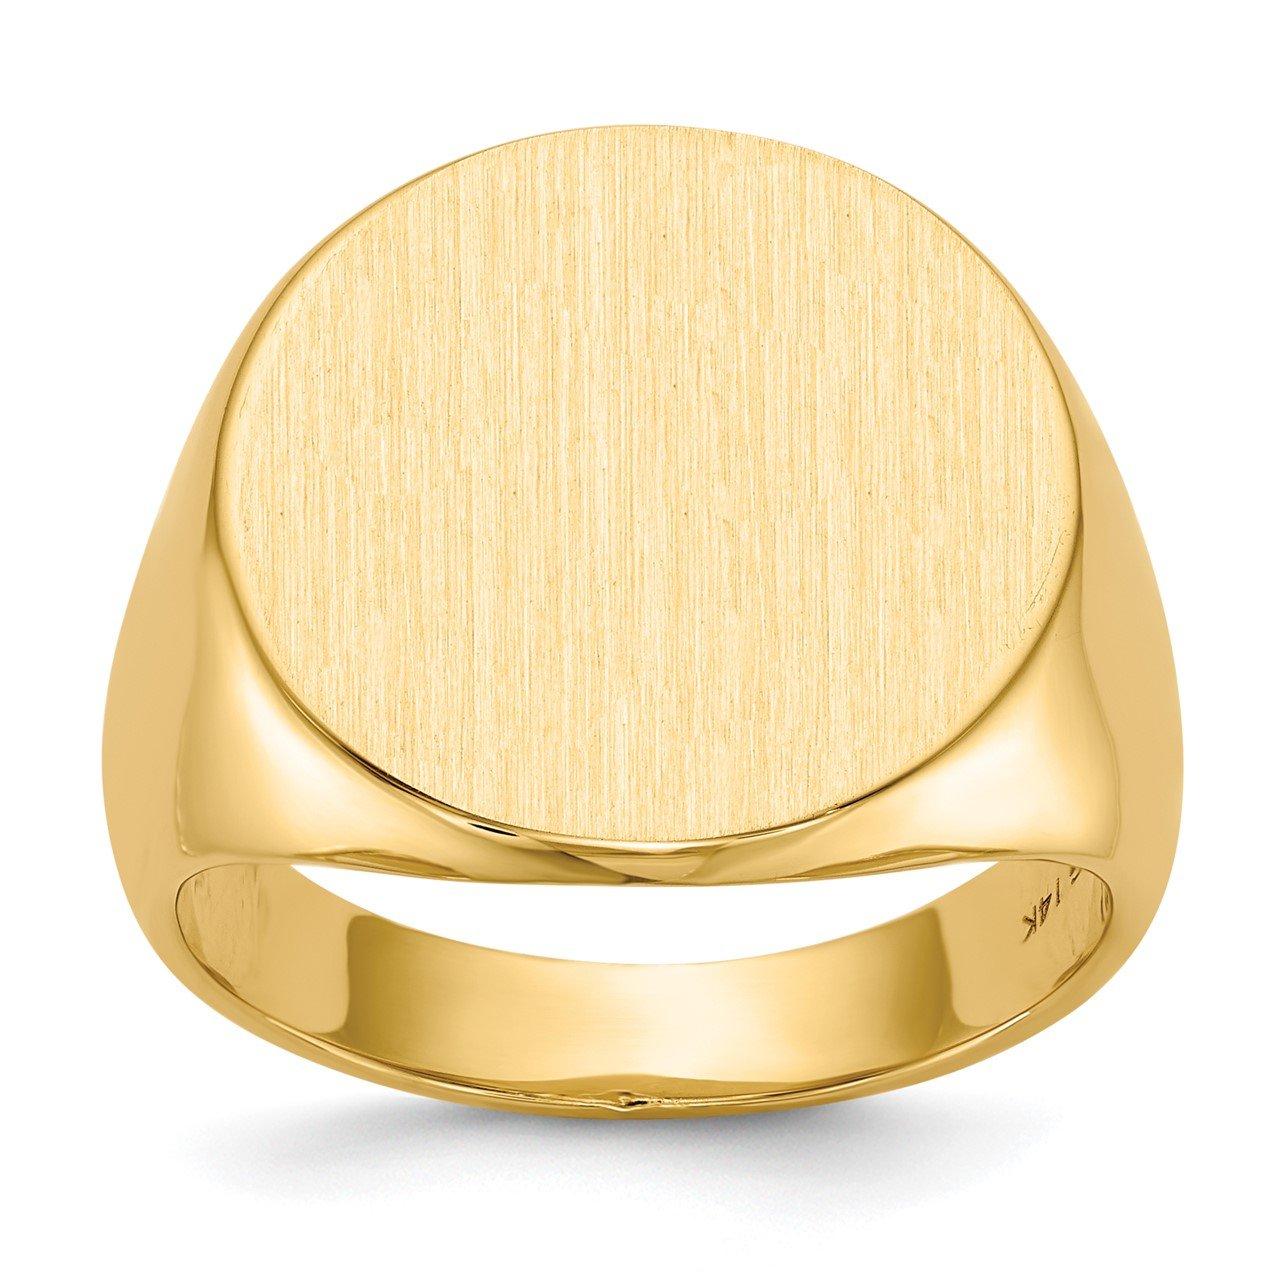 14k 17.5x18.0mm Closed Back Men's Signet Ring